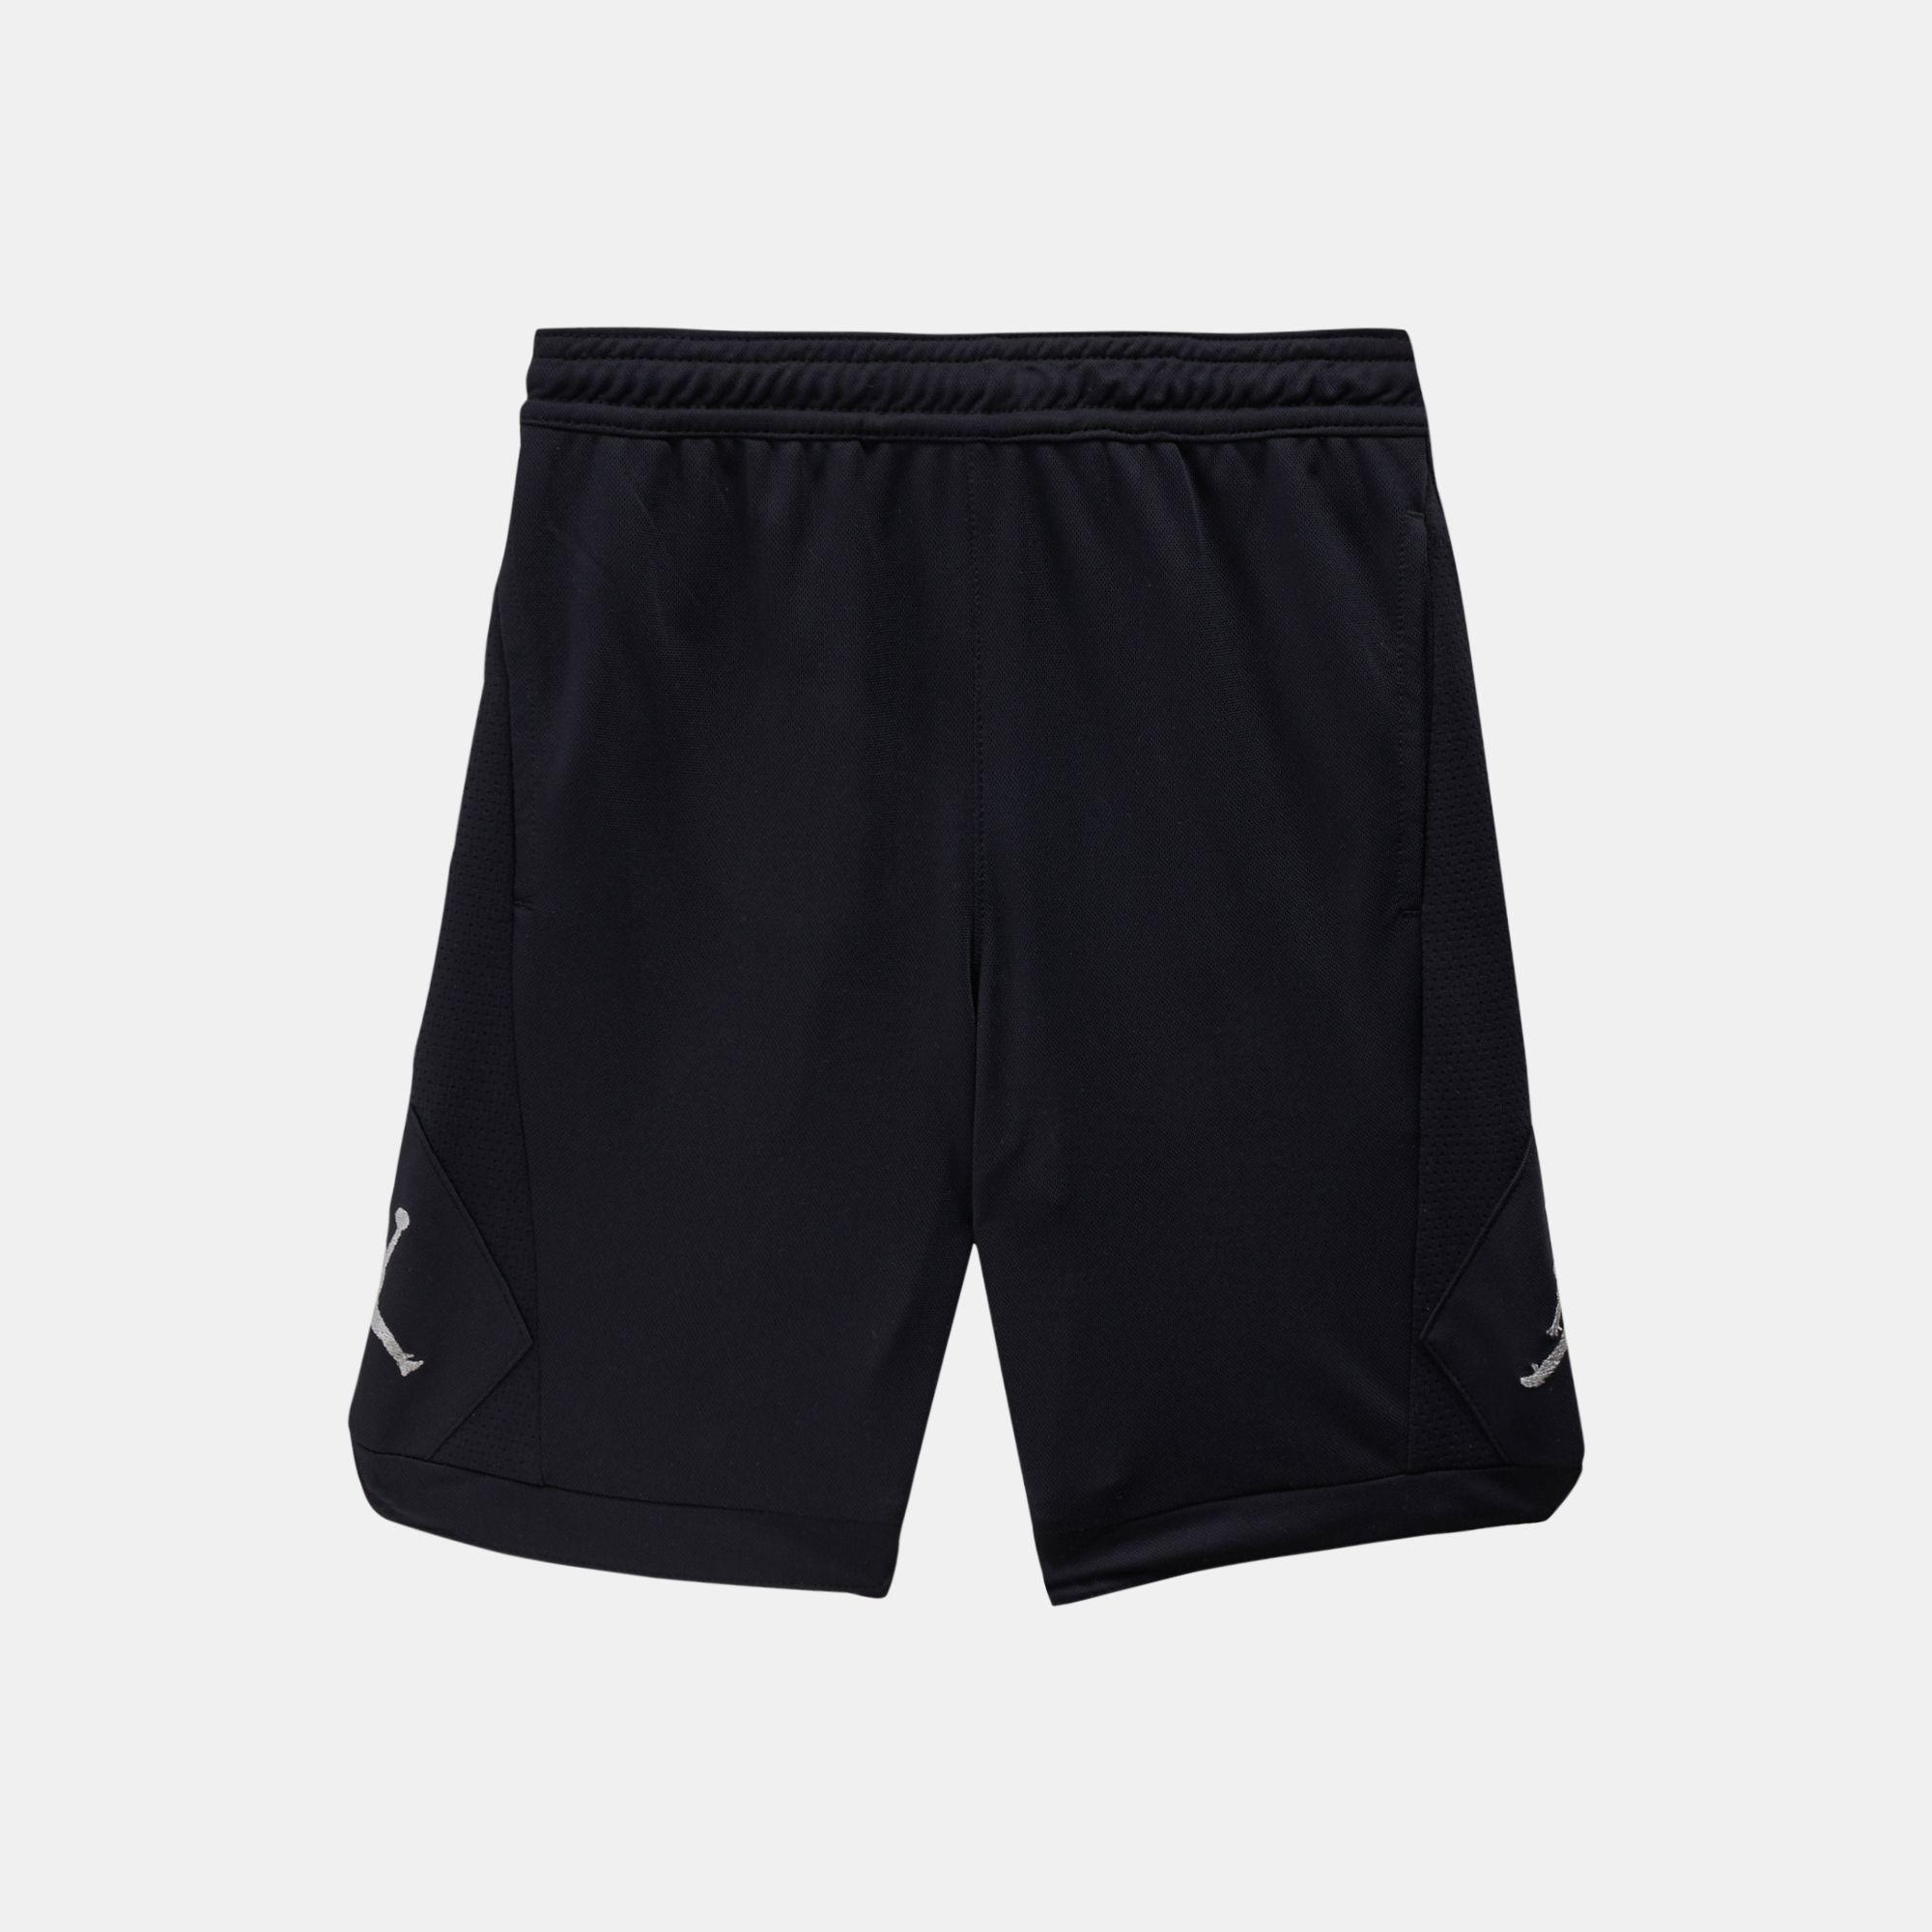 19013b34b32 Jordan Kids' Authentic Triangle Shorts (Younger Kids) | Shorts ...